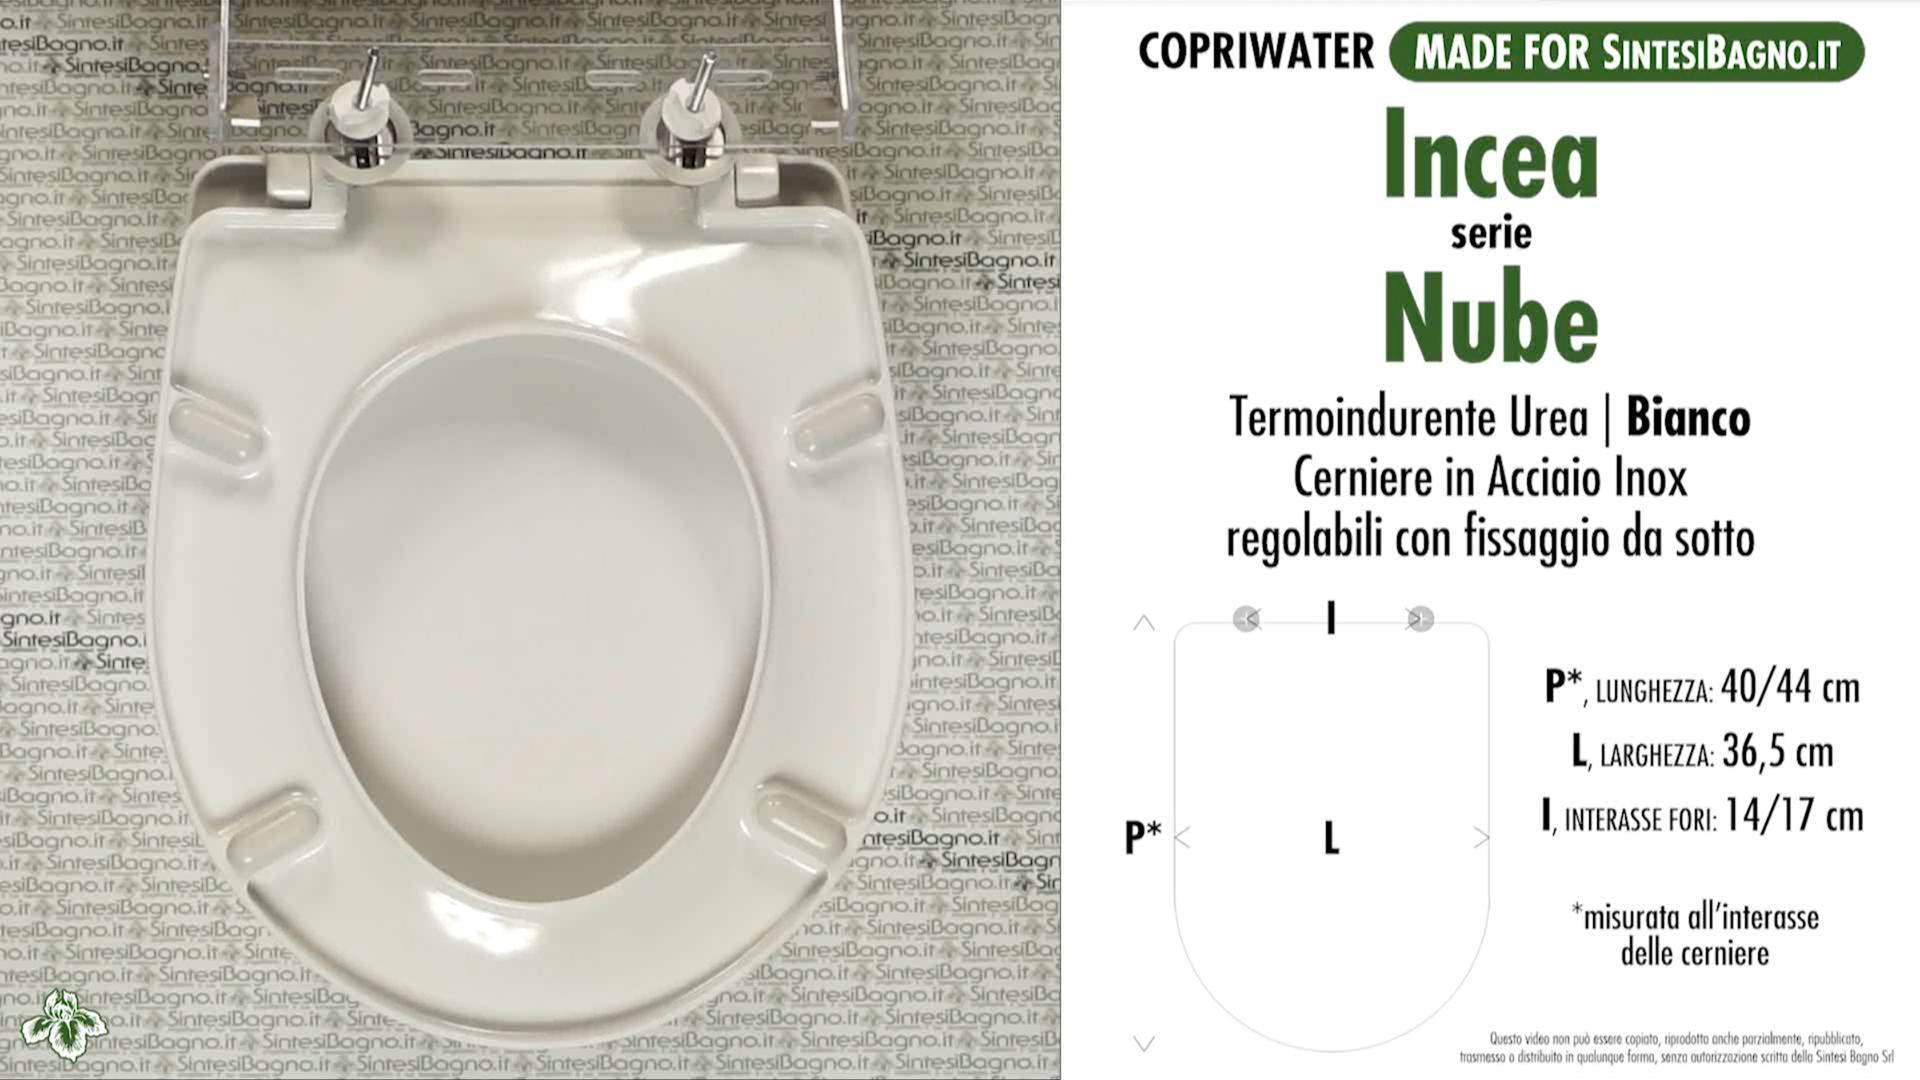 SCHEDA TECNICA MISURE copriwater INCEA NUBE